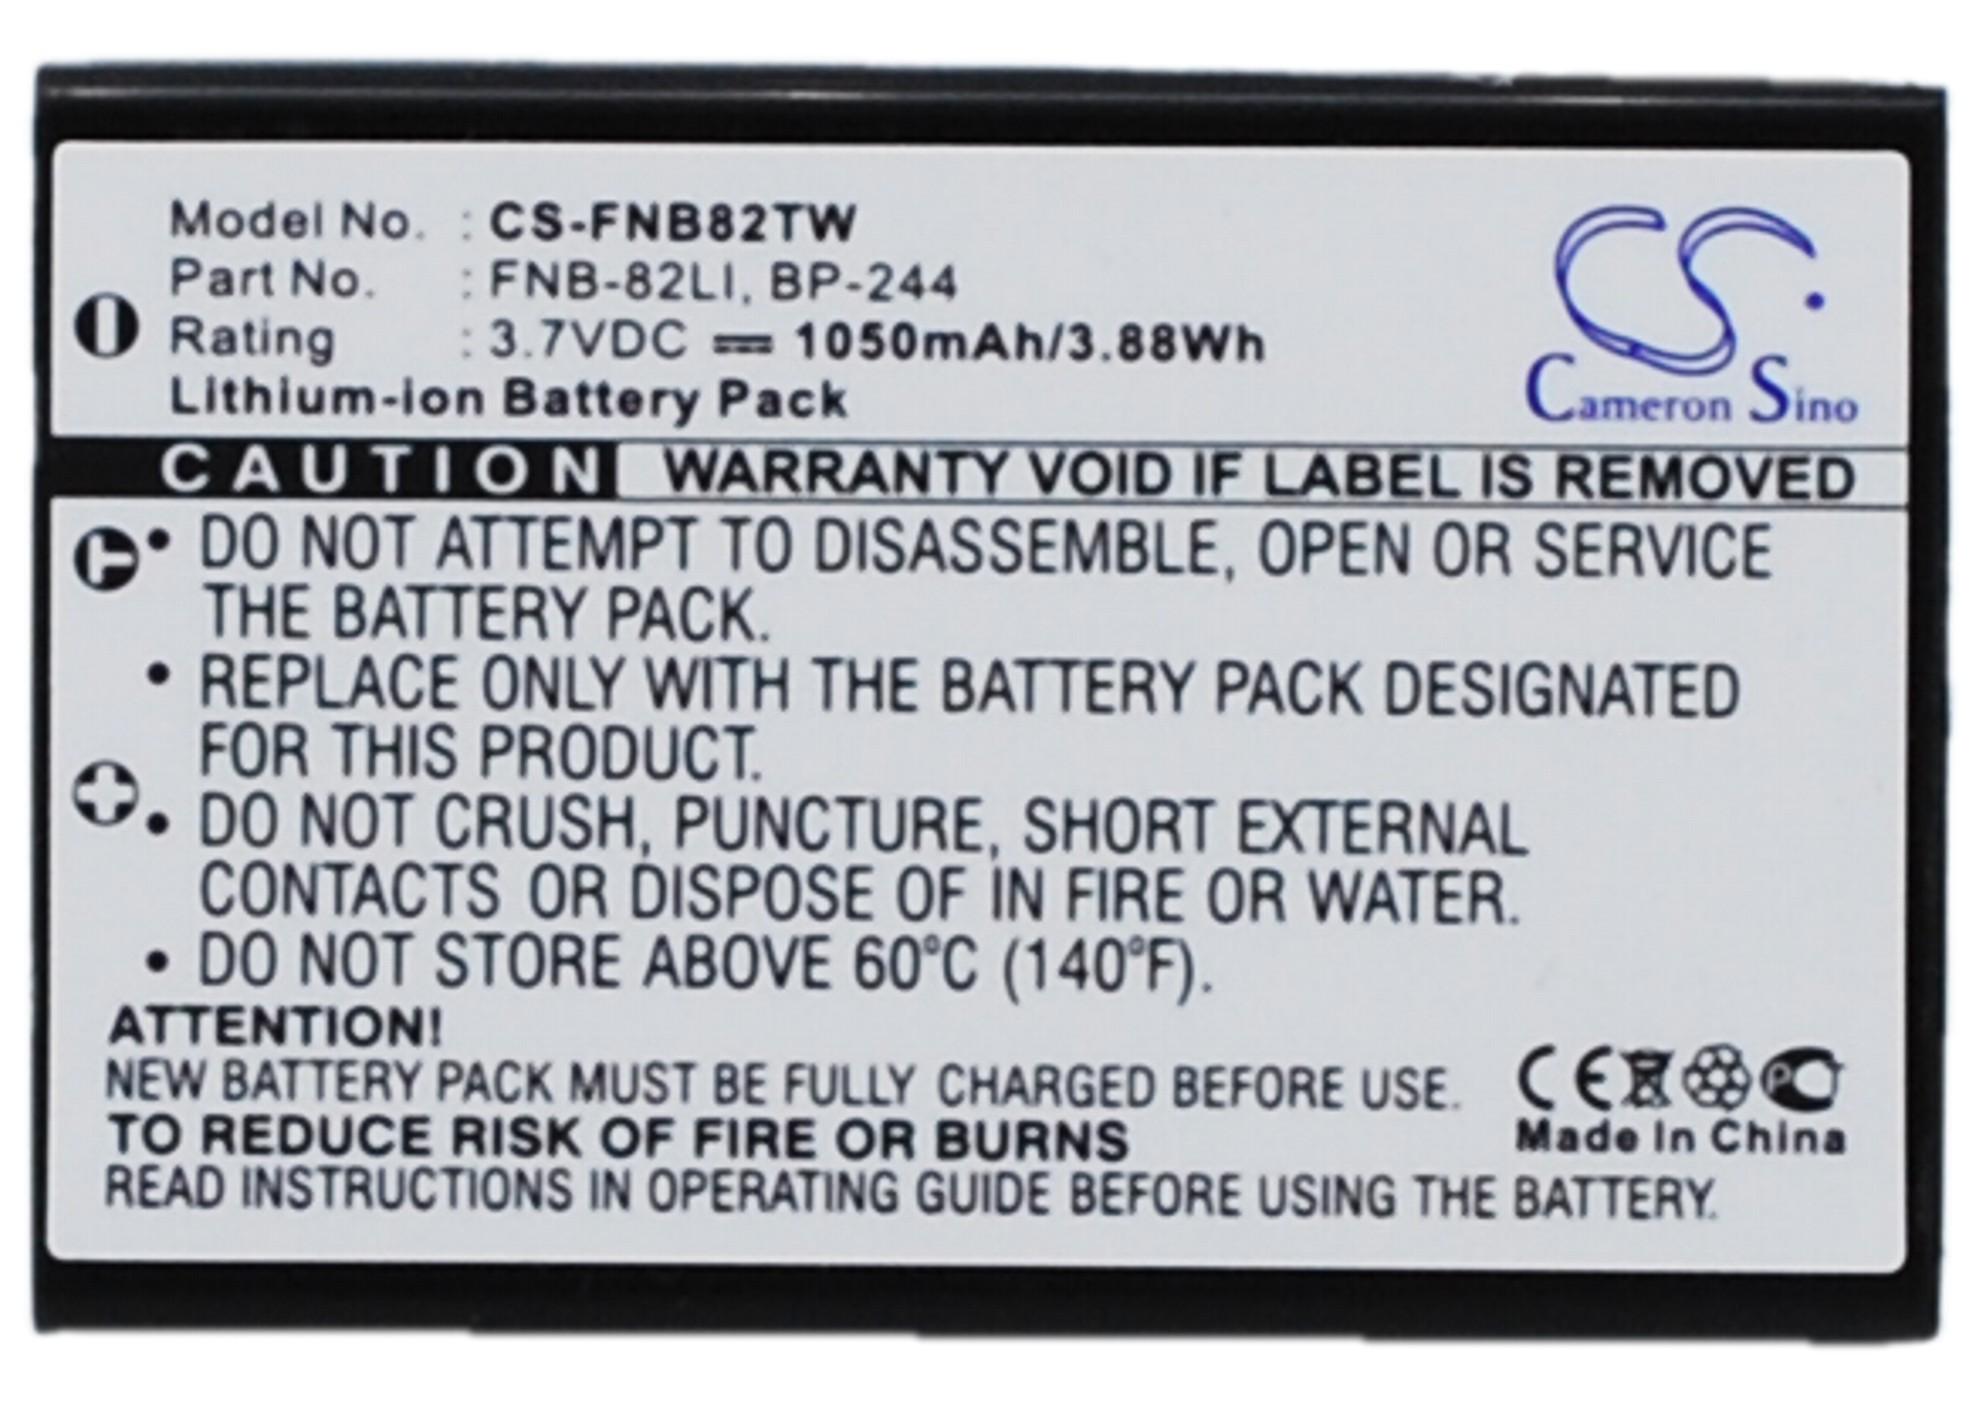 Cameron Sino baterie do vysílaček pro BAOFENG UV-3R Mark 2 3.7V Li-ion 1050mAh černá - neoriginální